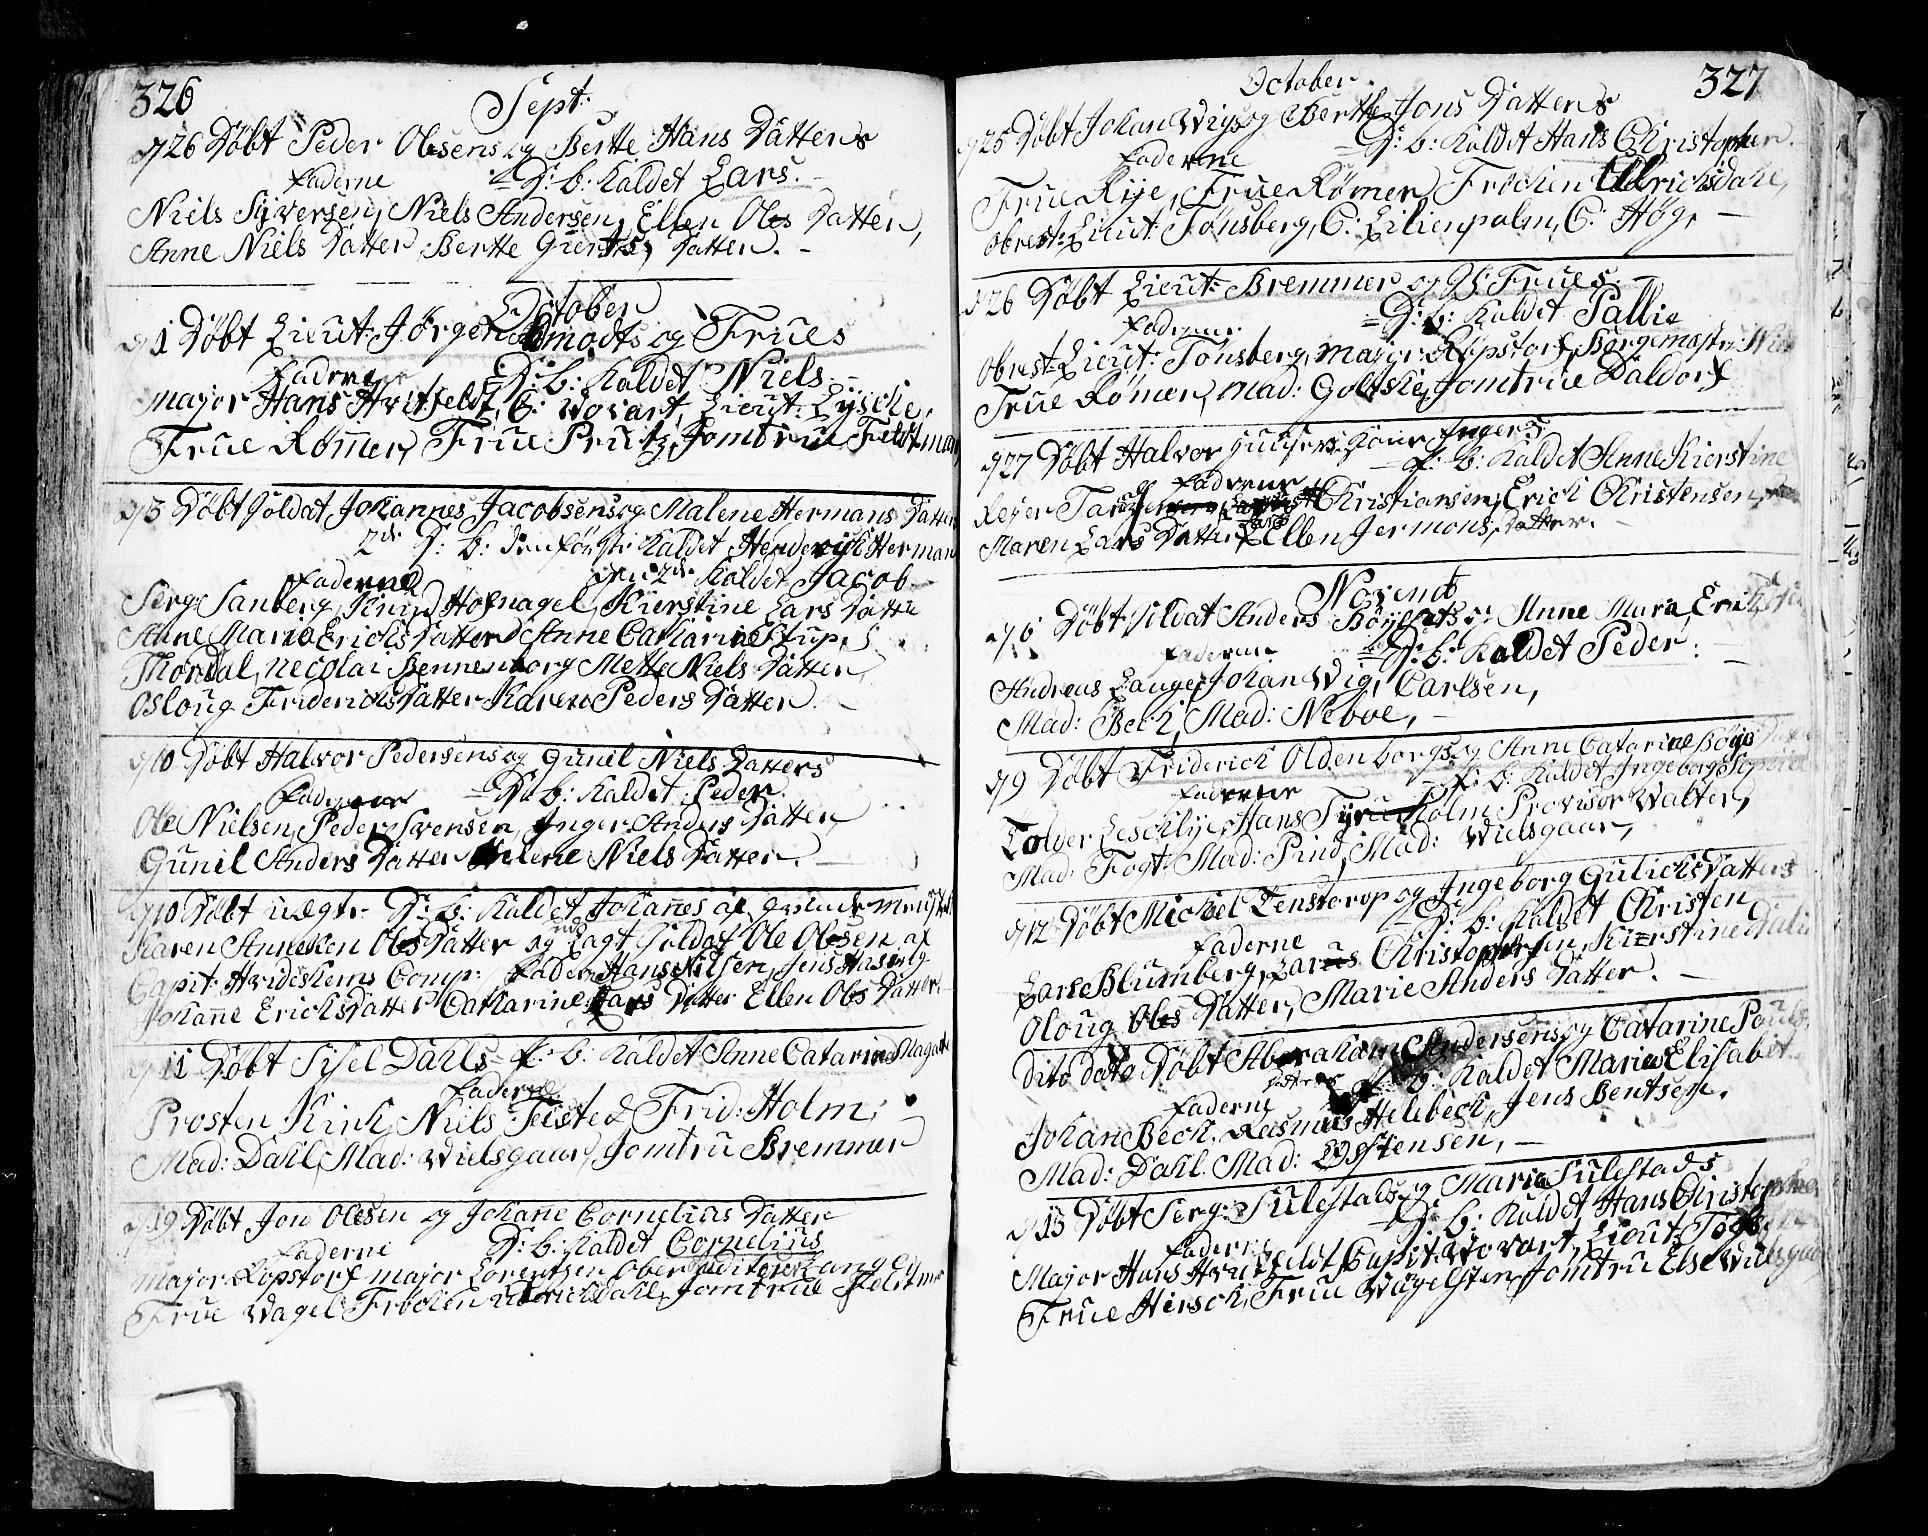 SAO, Fredrikstad prestekontor Kirkebøker, F/Fa/L0002: Ministerialbok nr. 2, 1750-1804, s. 326-327